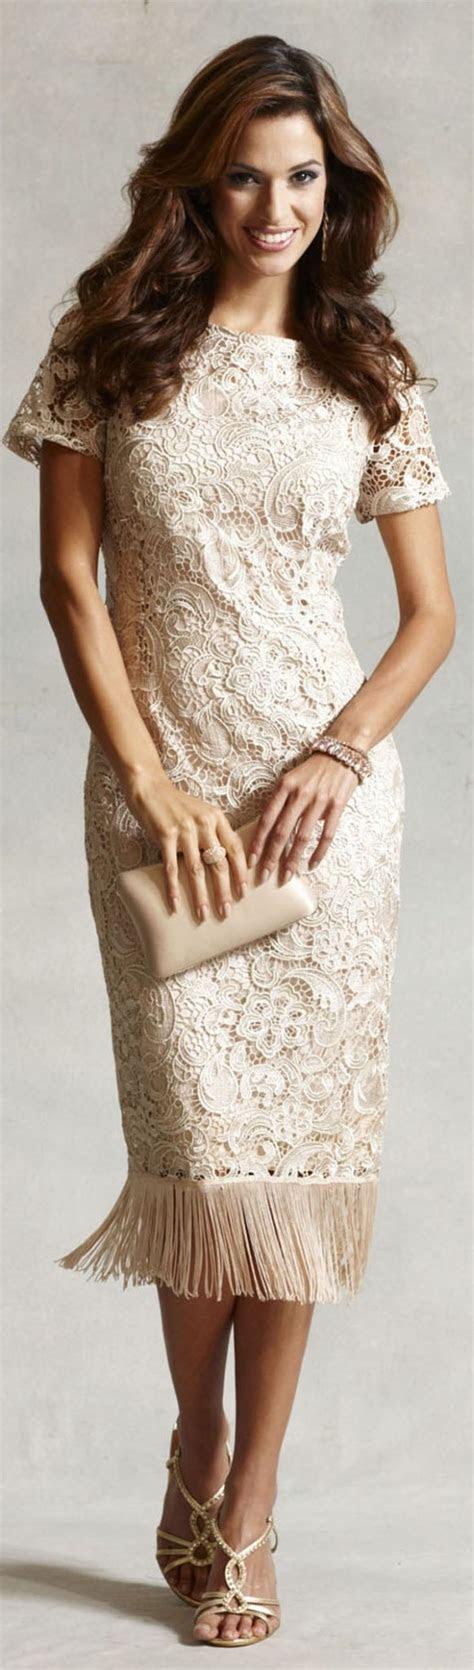 wedding dresses for older brides     IDoTakeTwo.com